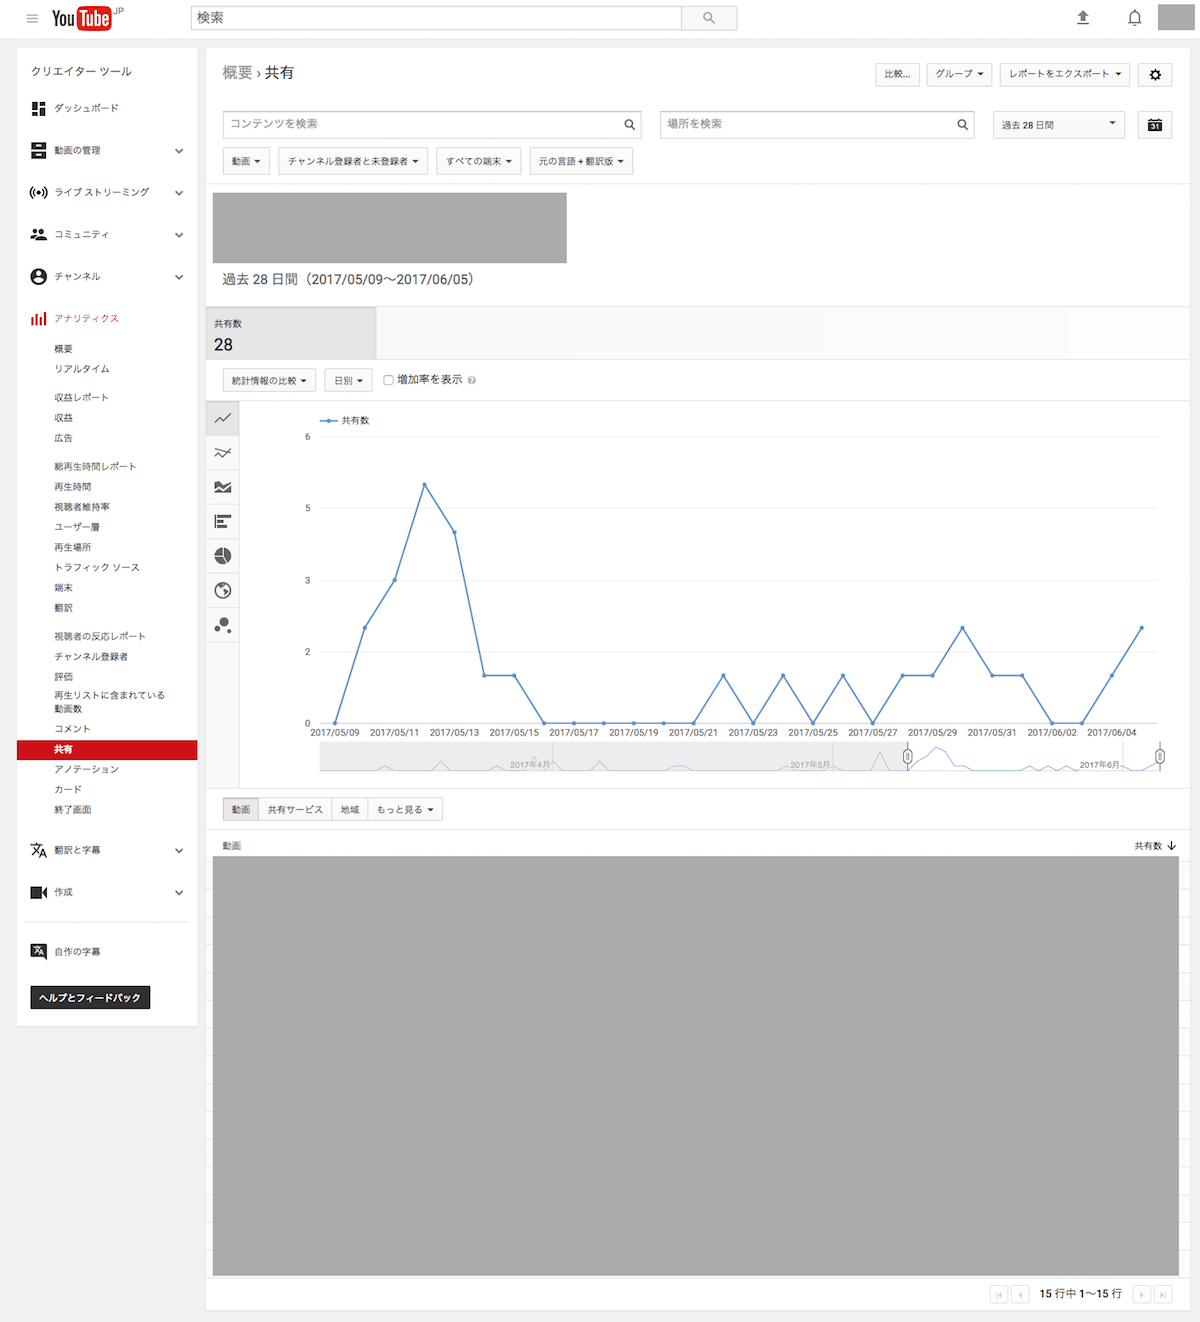 YA12 min YouTubeアナリティクスの使い方【初心者でもわかる!】